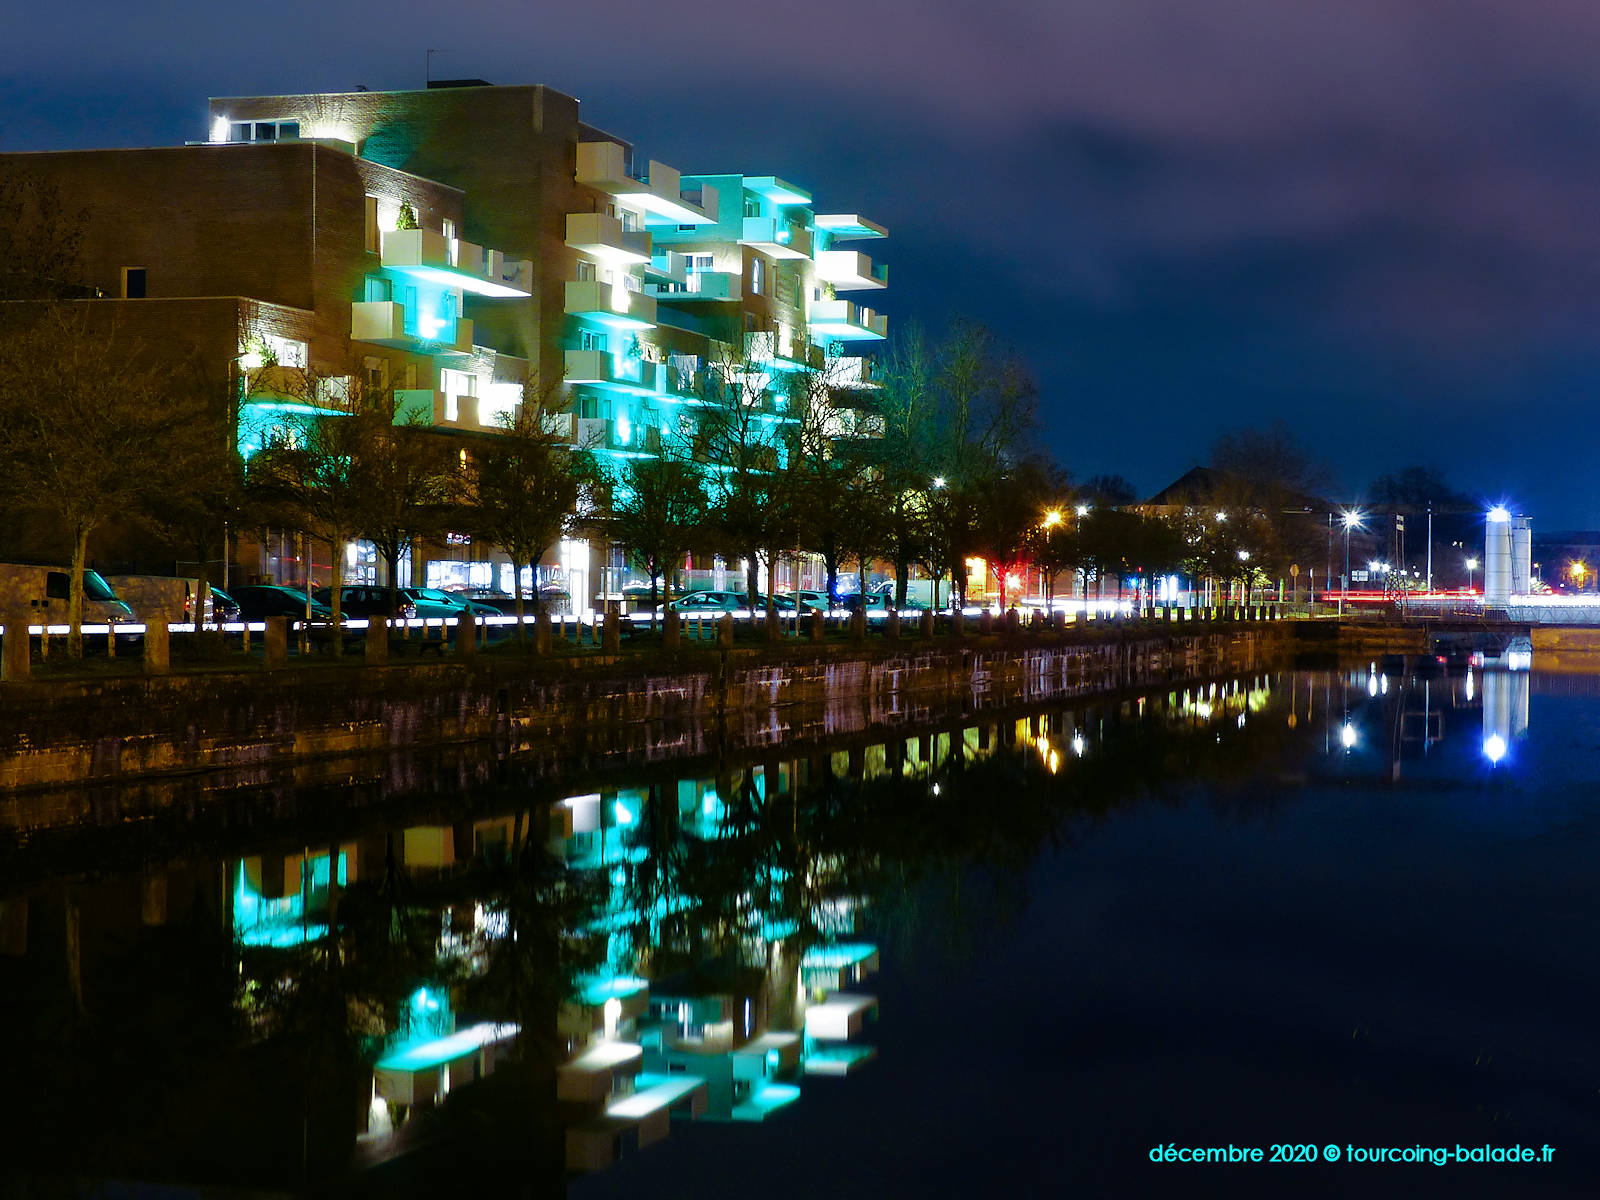 Résidence Equinox, Canal de Tourcoing, 2020